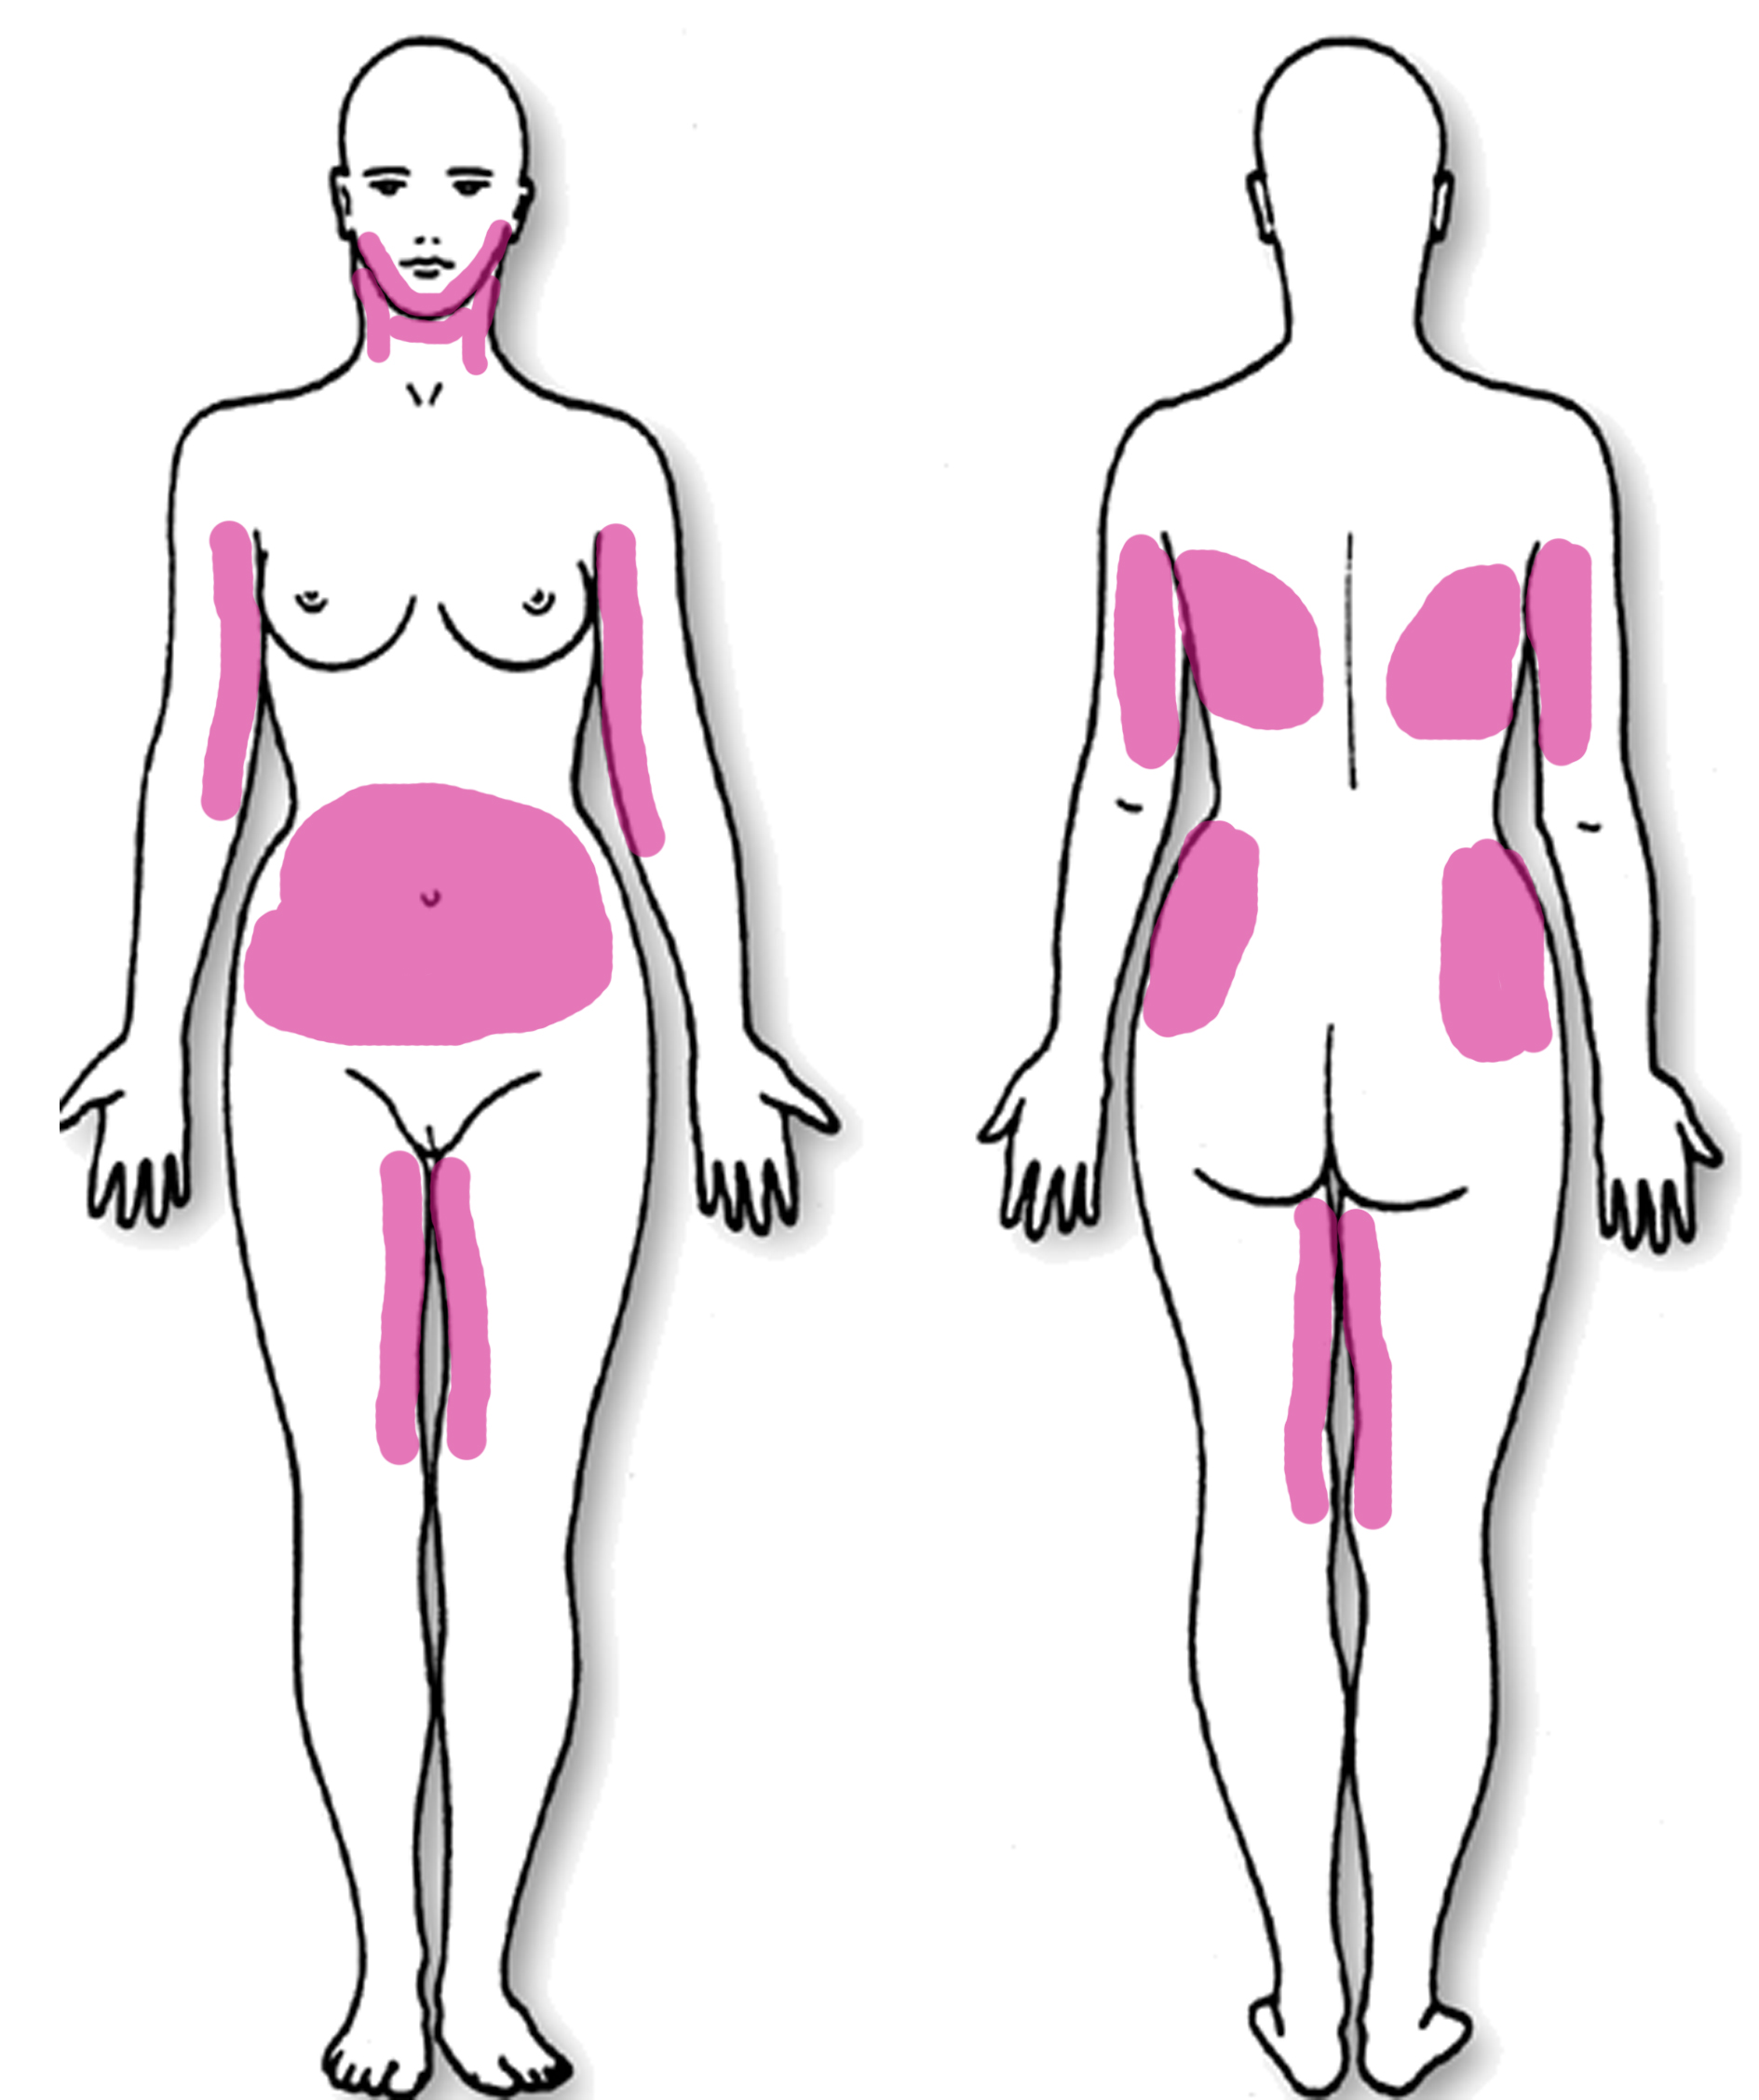 Where I'd get liposuction